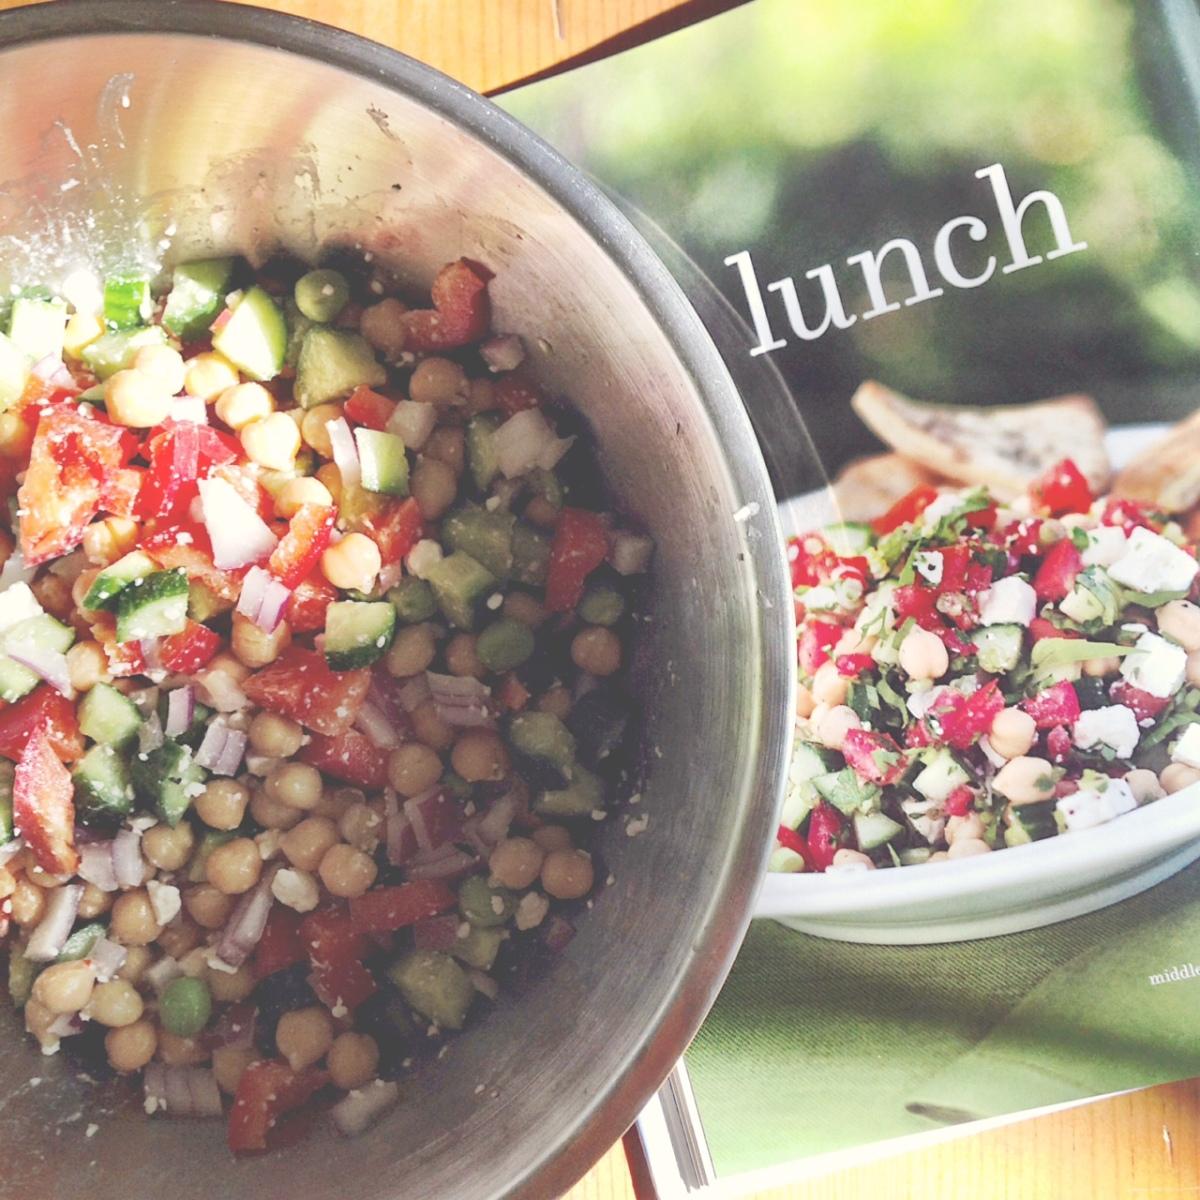 Middle Eastern Vegetable Salad 7.5/10